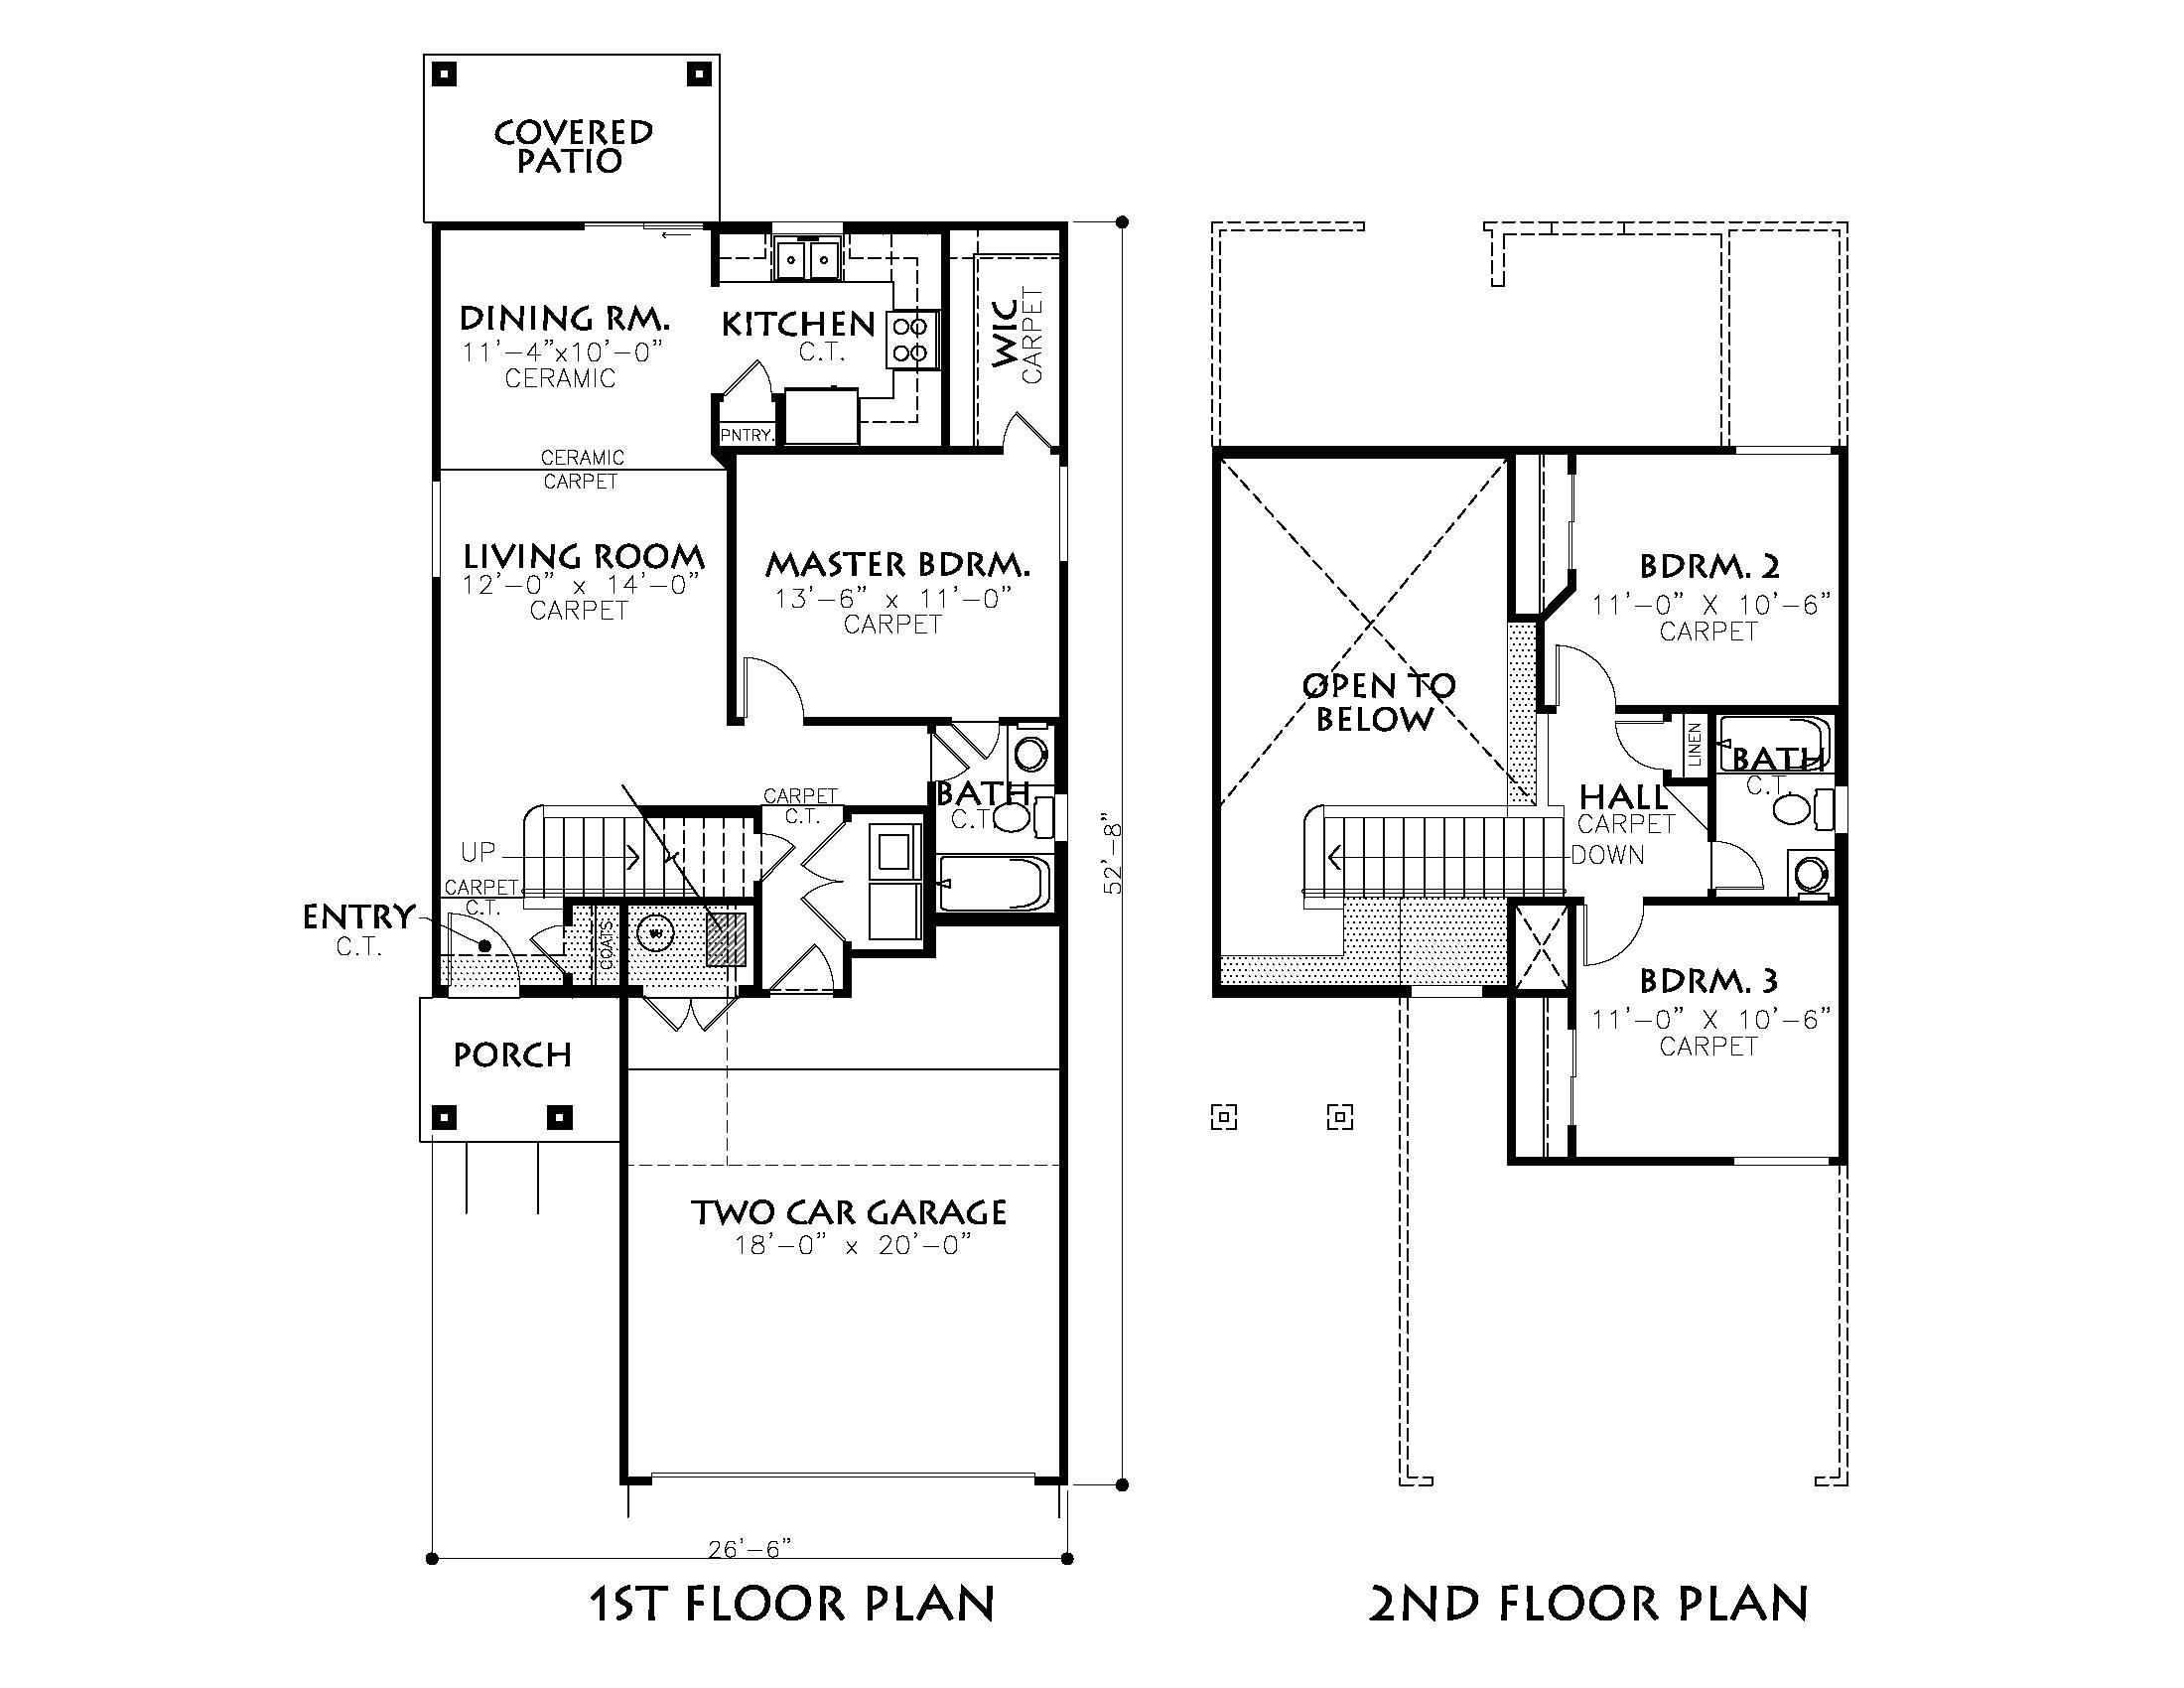 3 design ideas of classic american homes